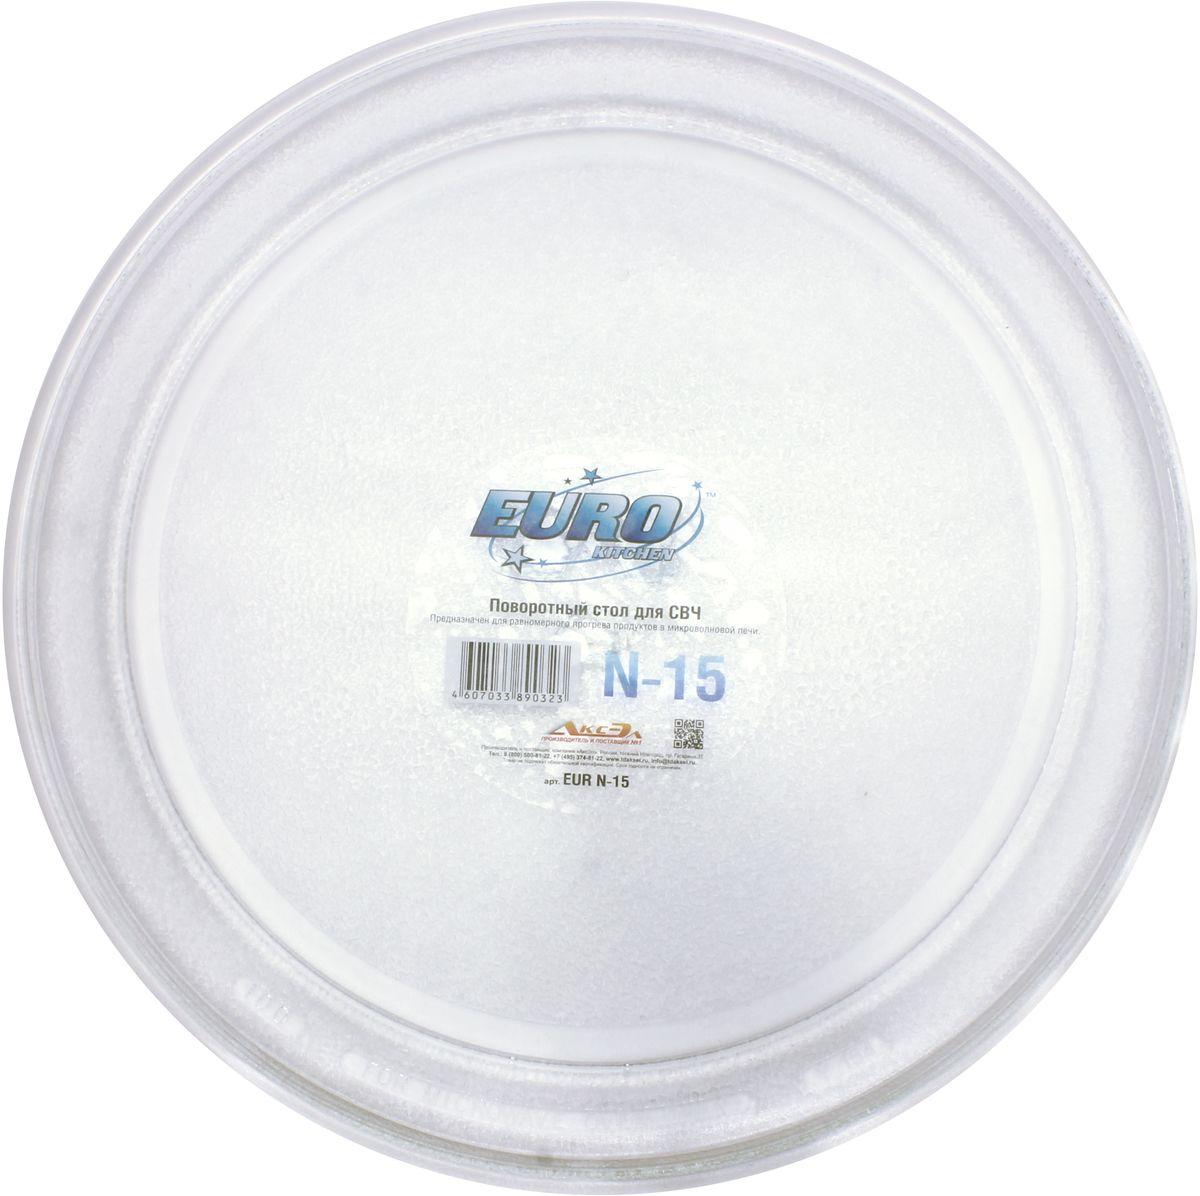 Euro Kitchen N-15 тарелка для СВЧN-15Универсальная тарелка N-15 для микроволновой печи с куплером. Диаметр тарелки 335 мм. Изготовлена из специального жаропрочного стекла. Предназначена для равномерного разогрева продуктов в микроволновой печи.Подходит для брендов: Aeg, Airhot, Amica, Ardo, Ariston, Asko, Atlanta, Aurora, Ava, Barazza, Bauknecht, Bbk, Beko, Bomann, Bork, Bosch, Brandt, Candy, Cata, Centek, Clatronic,Daewoo, De dietrich, Delfa, Electrolux, Elenberg, Ergo, Erisson, Eurotec, Fagor, Fimar, Foster, Franke, Fulgor, Fusion, Gaggenau, Gastrorag, Goldstar, Gorenje, Hankel, Hansa, Hilton, Horizont, Hurakan, Hyundai, Ilve, Indesit, Kaiser, Kenmore, Kenwood, Korting, Kuppersberg, Kuppersbusch, Kamark, Keran, Lg, Liberton, Liberty, Maxwell, Menumaster, Midea, Miele, Moulinex, Mystery, Neff, Oursson, Panasonic, Proficook, Rainford, Redmond, Rolsen, Samsung, Saturn, Scarlett, Sencor, Sharp, Siemens, Simfer, Sinbo, Sirman, Smeg, Supra, Teka, Thomson, Toshiba, V-zug, Vasko, Vimar, Vitek, Vr, Weissgauff, West, Whirlpool, Zanussi, Zelmer, Zigmund&Shtain, Витязь, Рубин.